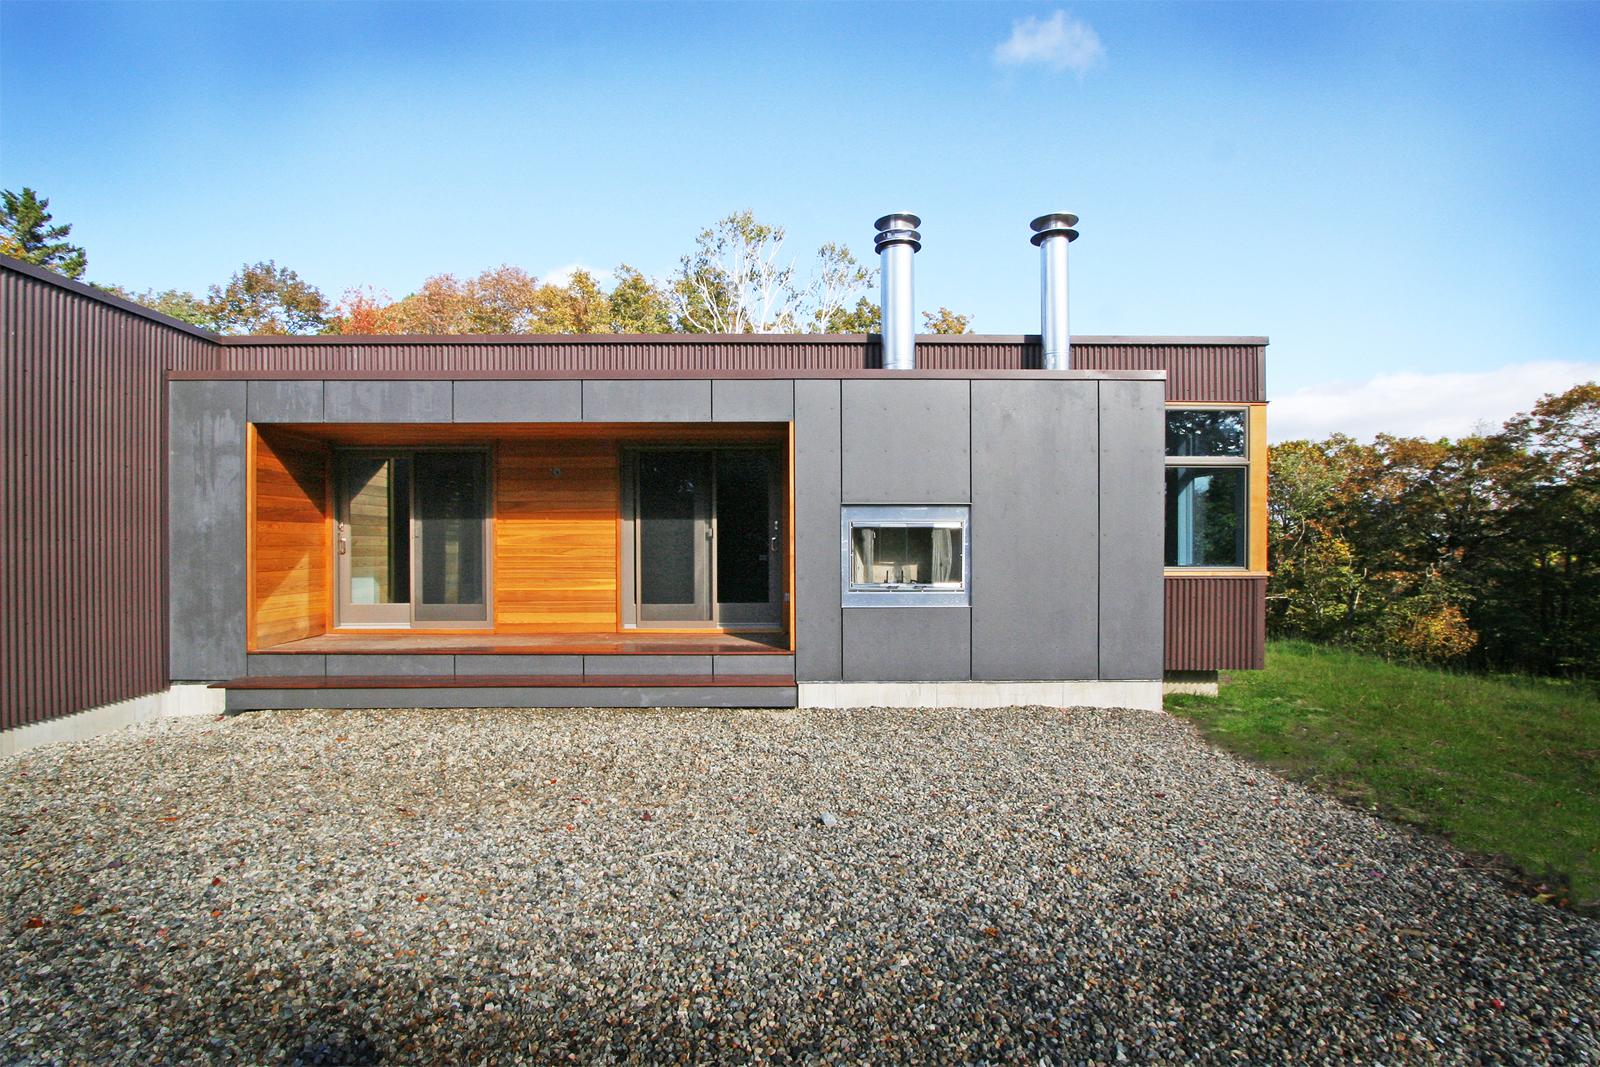 05-res4-resolution-4-architecture-modern-modular-home-prefab-house-vermont-cabin-exterior.jpg